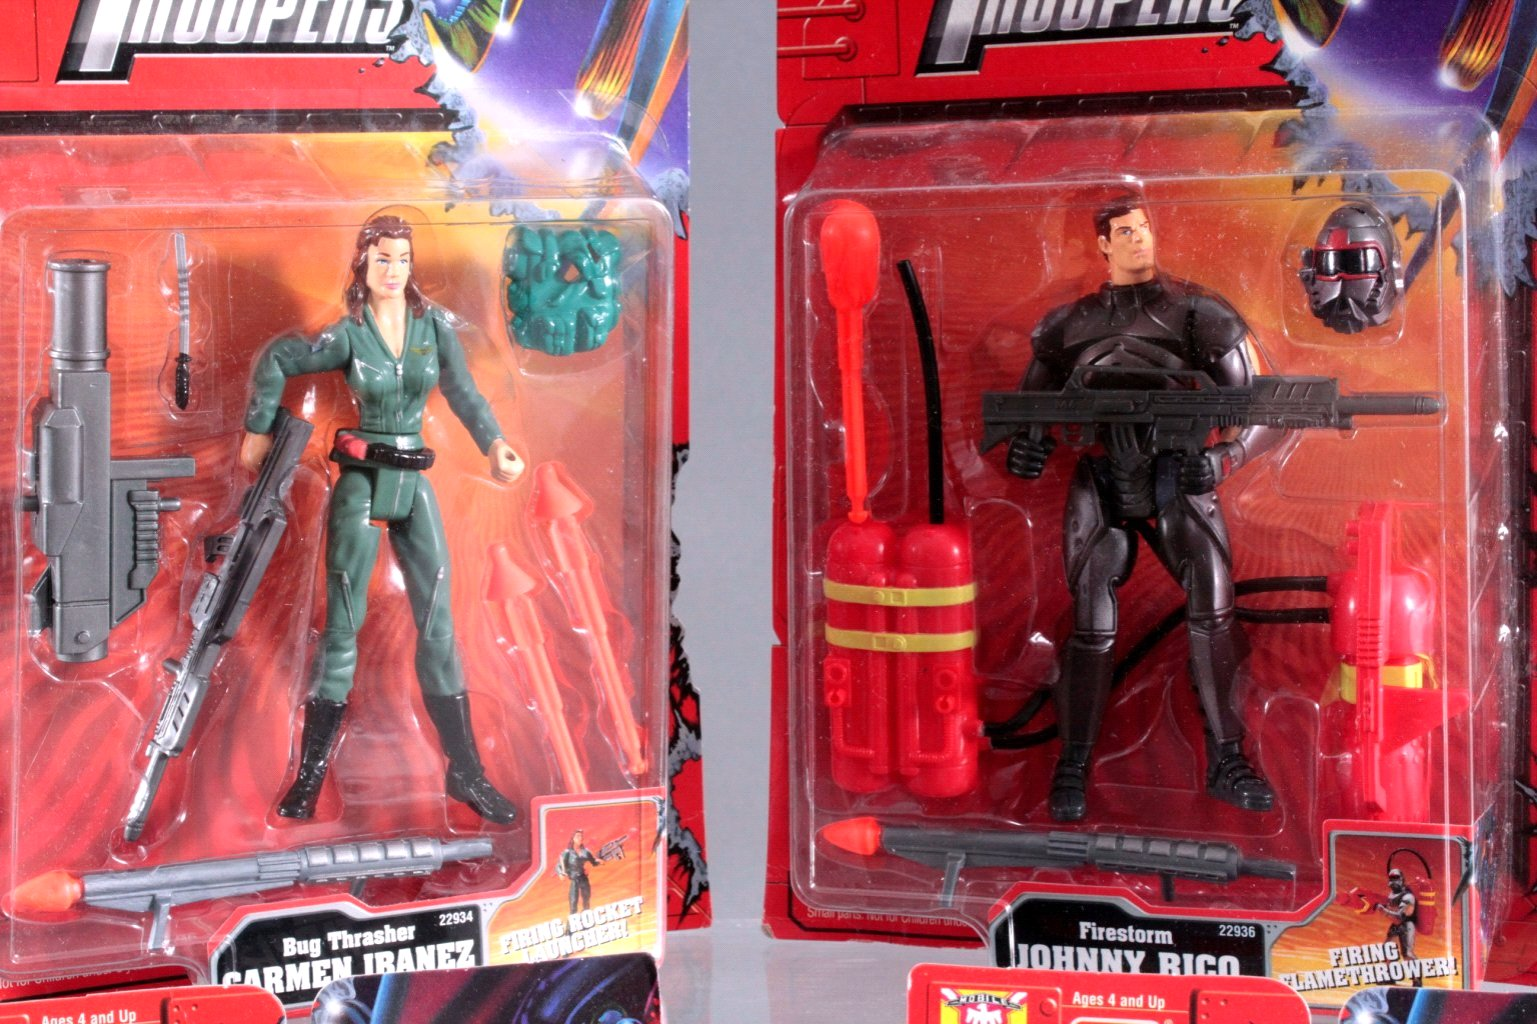 Starship Troopers Action Figuren 4 Stück-1